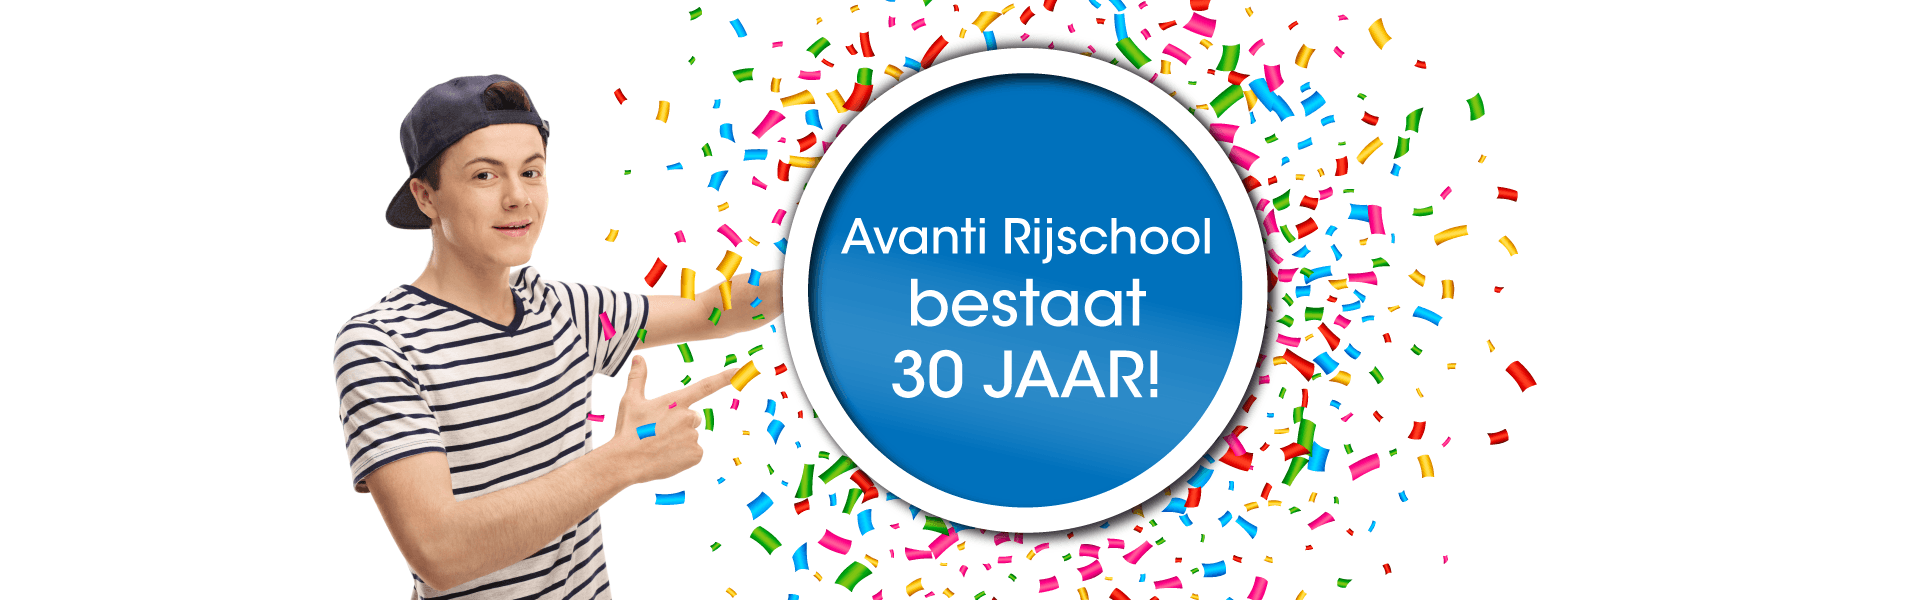 Rijschool Avanti Rotterdam Jubileum